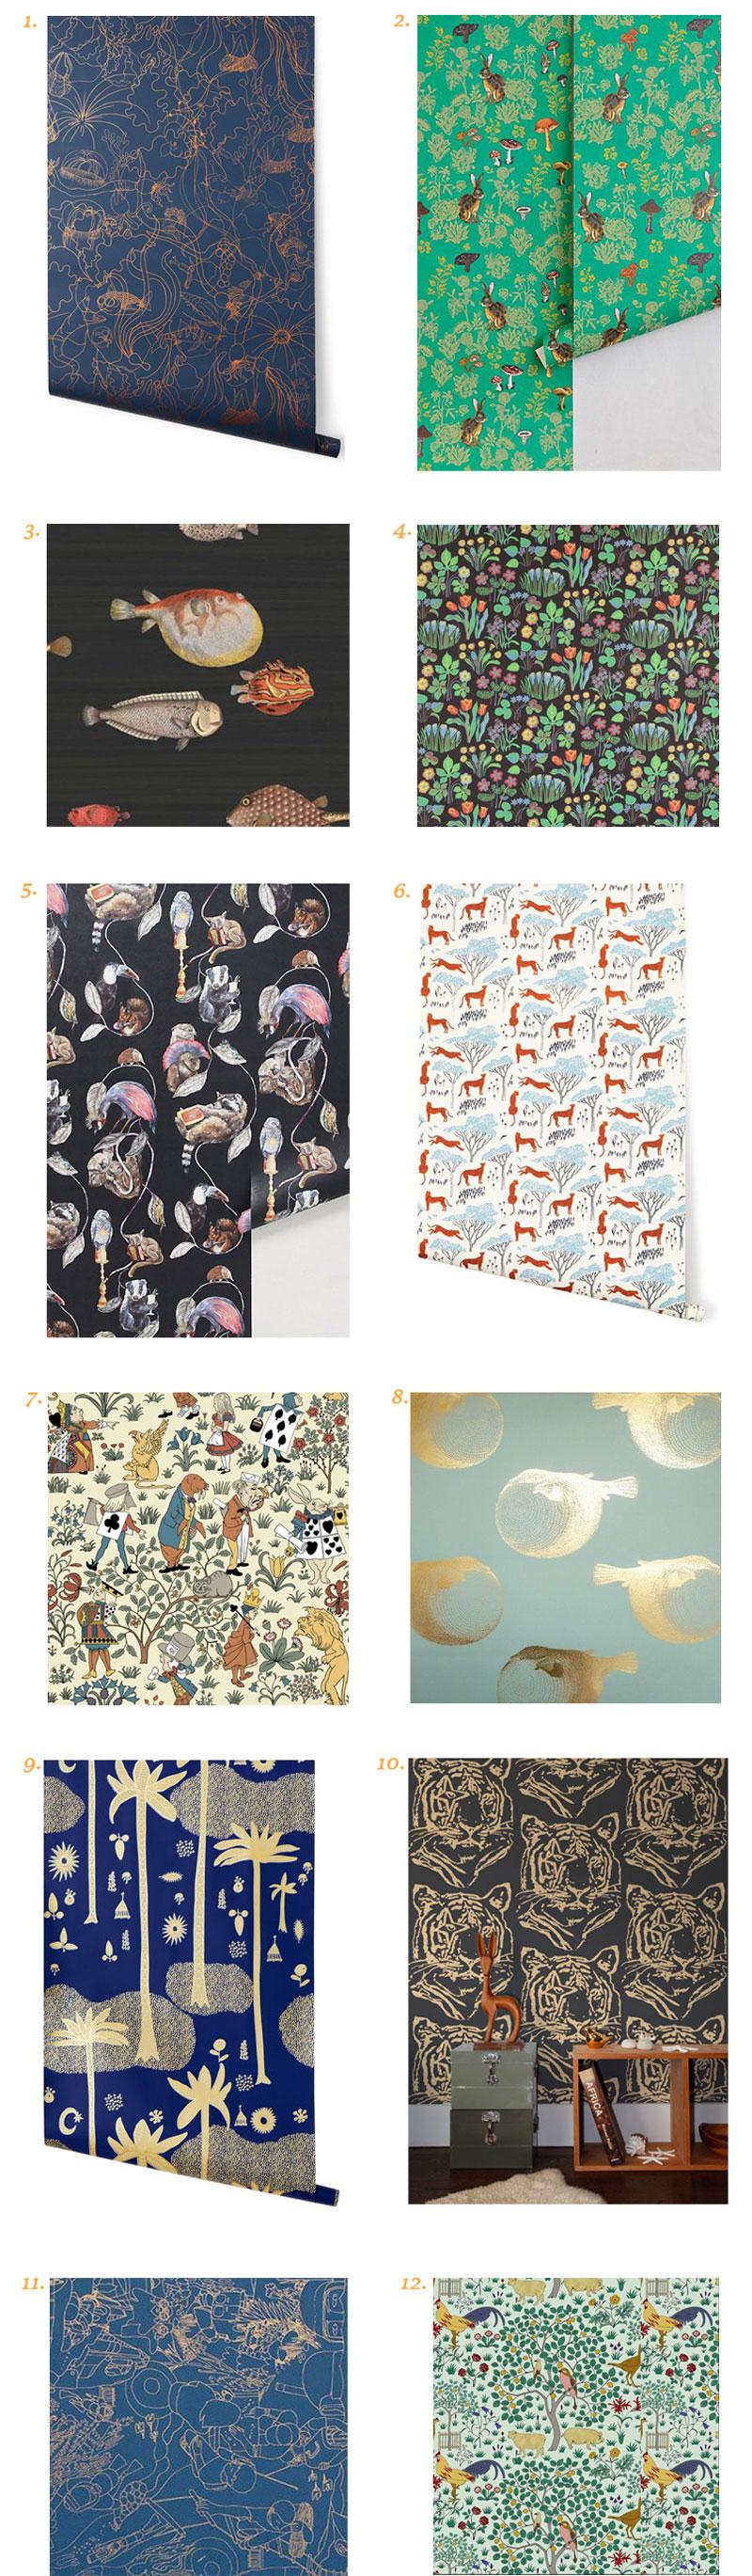 jestcafe.com--wallpapers-for-nursery